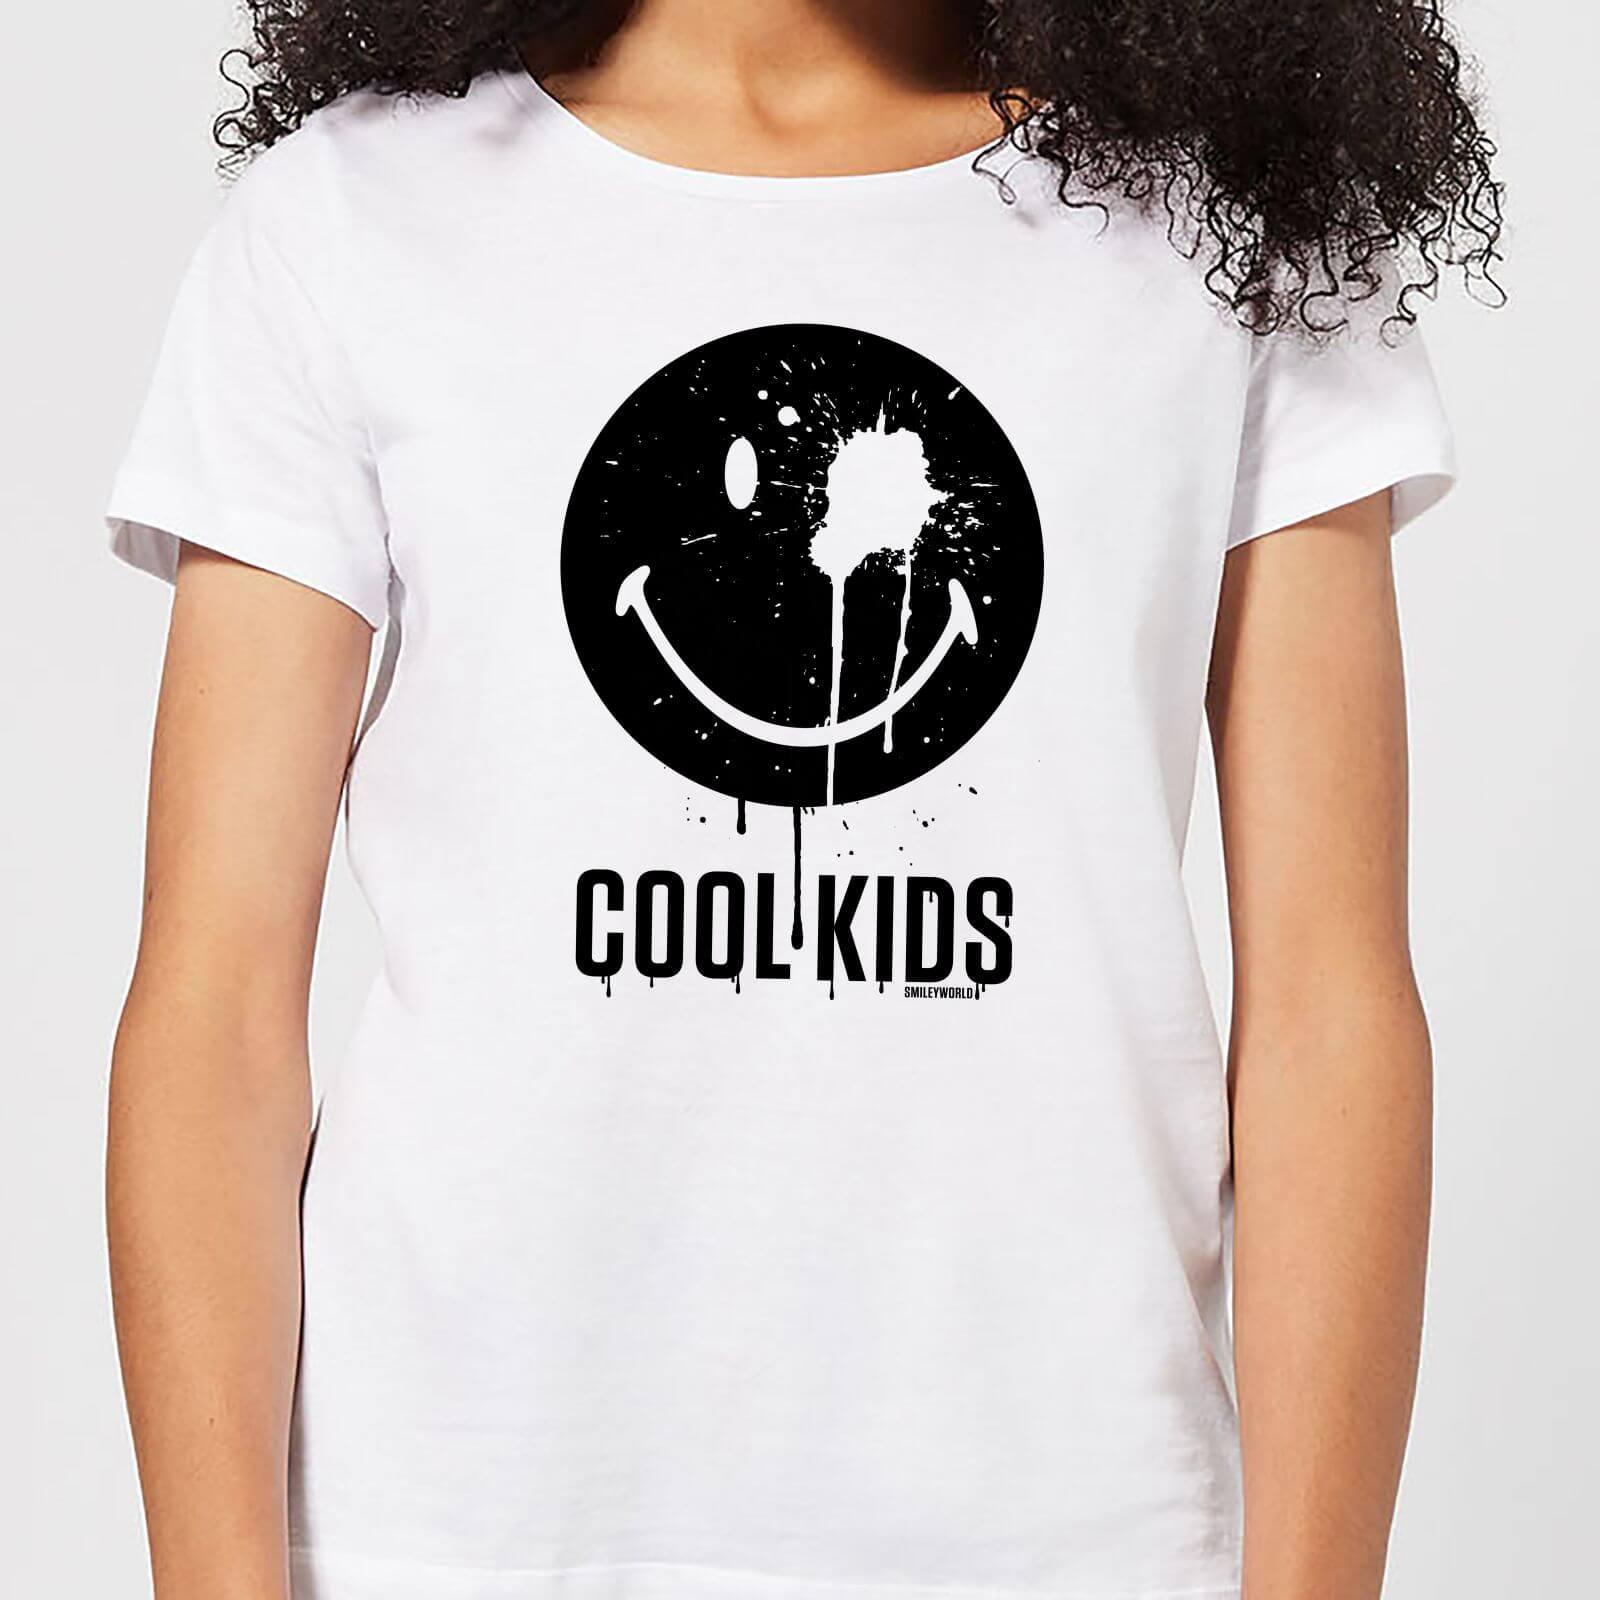 Smiley World Slogan Cool Kids Women's T-Shirt - White - L - White